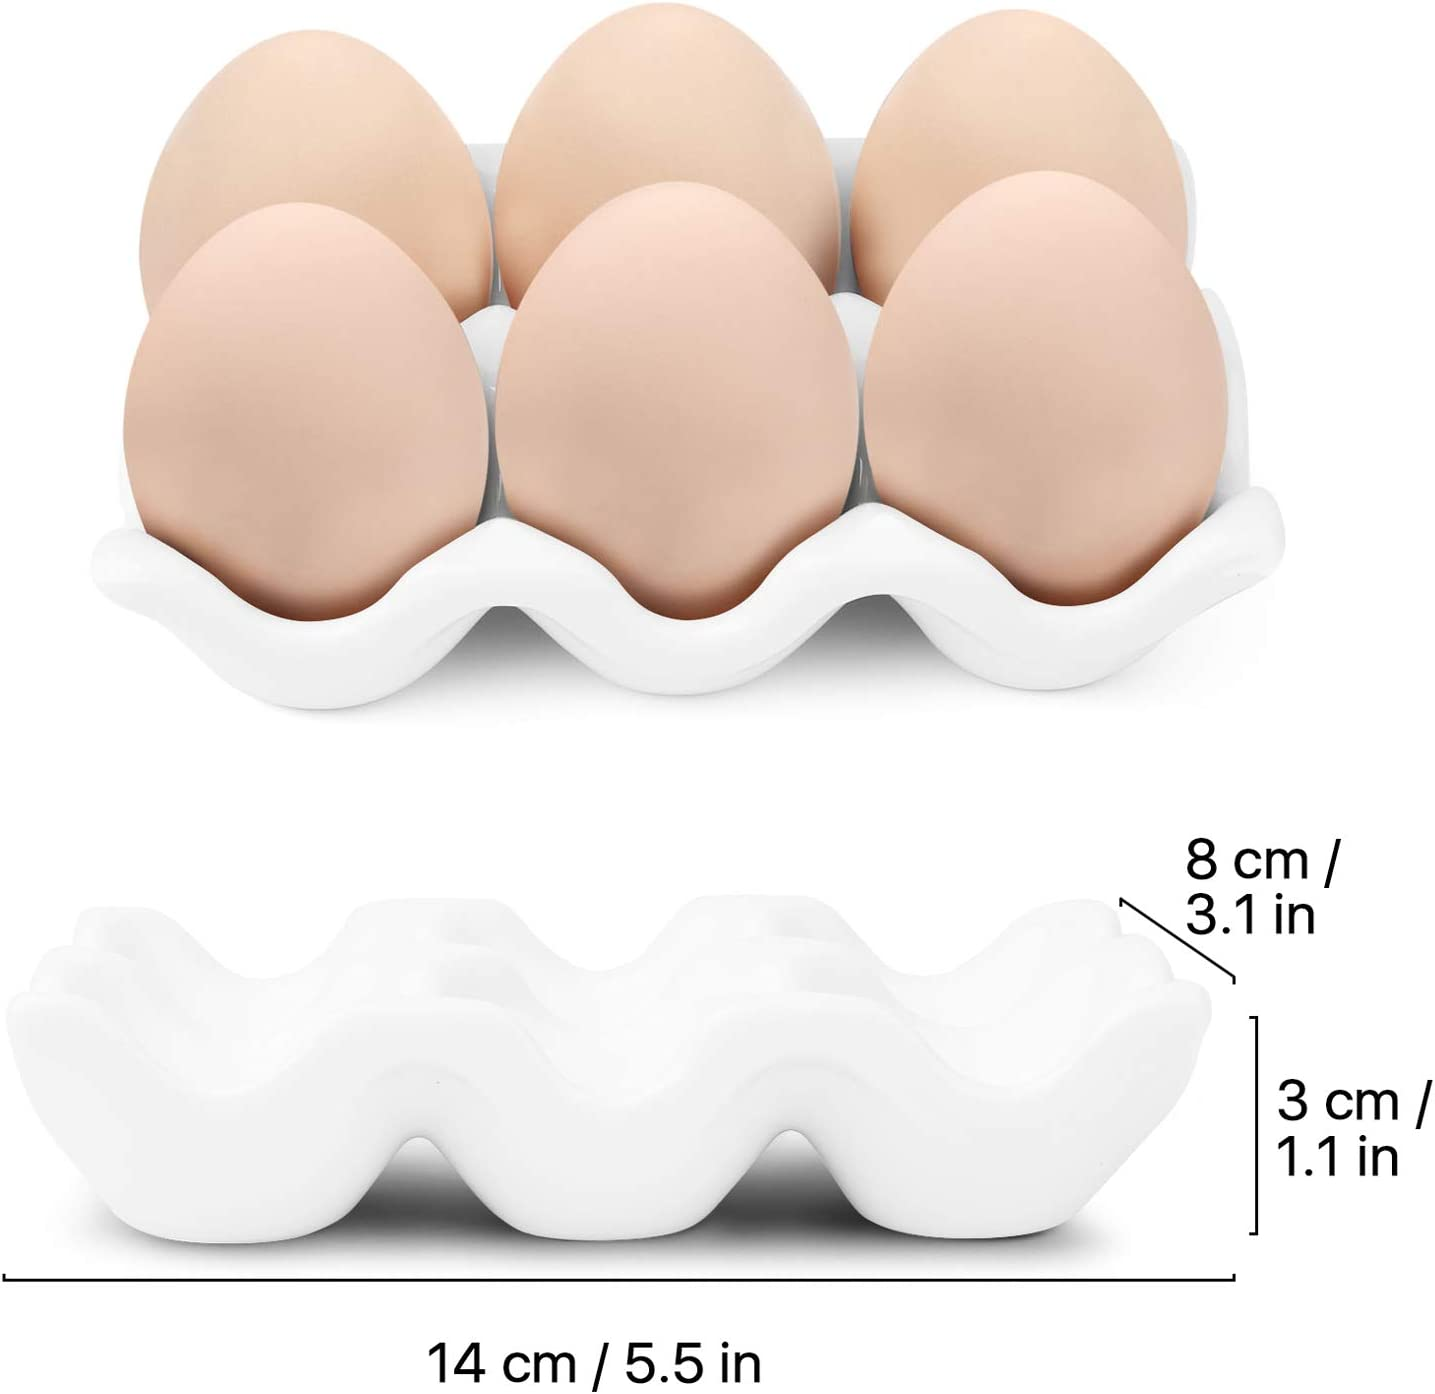 Whole Dozen Porcelain Egg Holder Container Keeper Storage Organizer Decorative Serving Dish Plate for Refrigerator Fridge Countertop Display Kitchen Home Flexzion Ceramic 12 Cups Egg Tray White